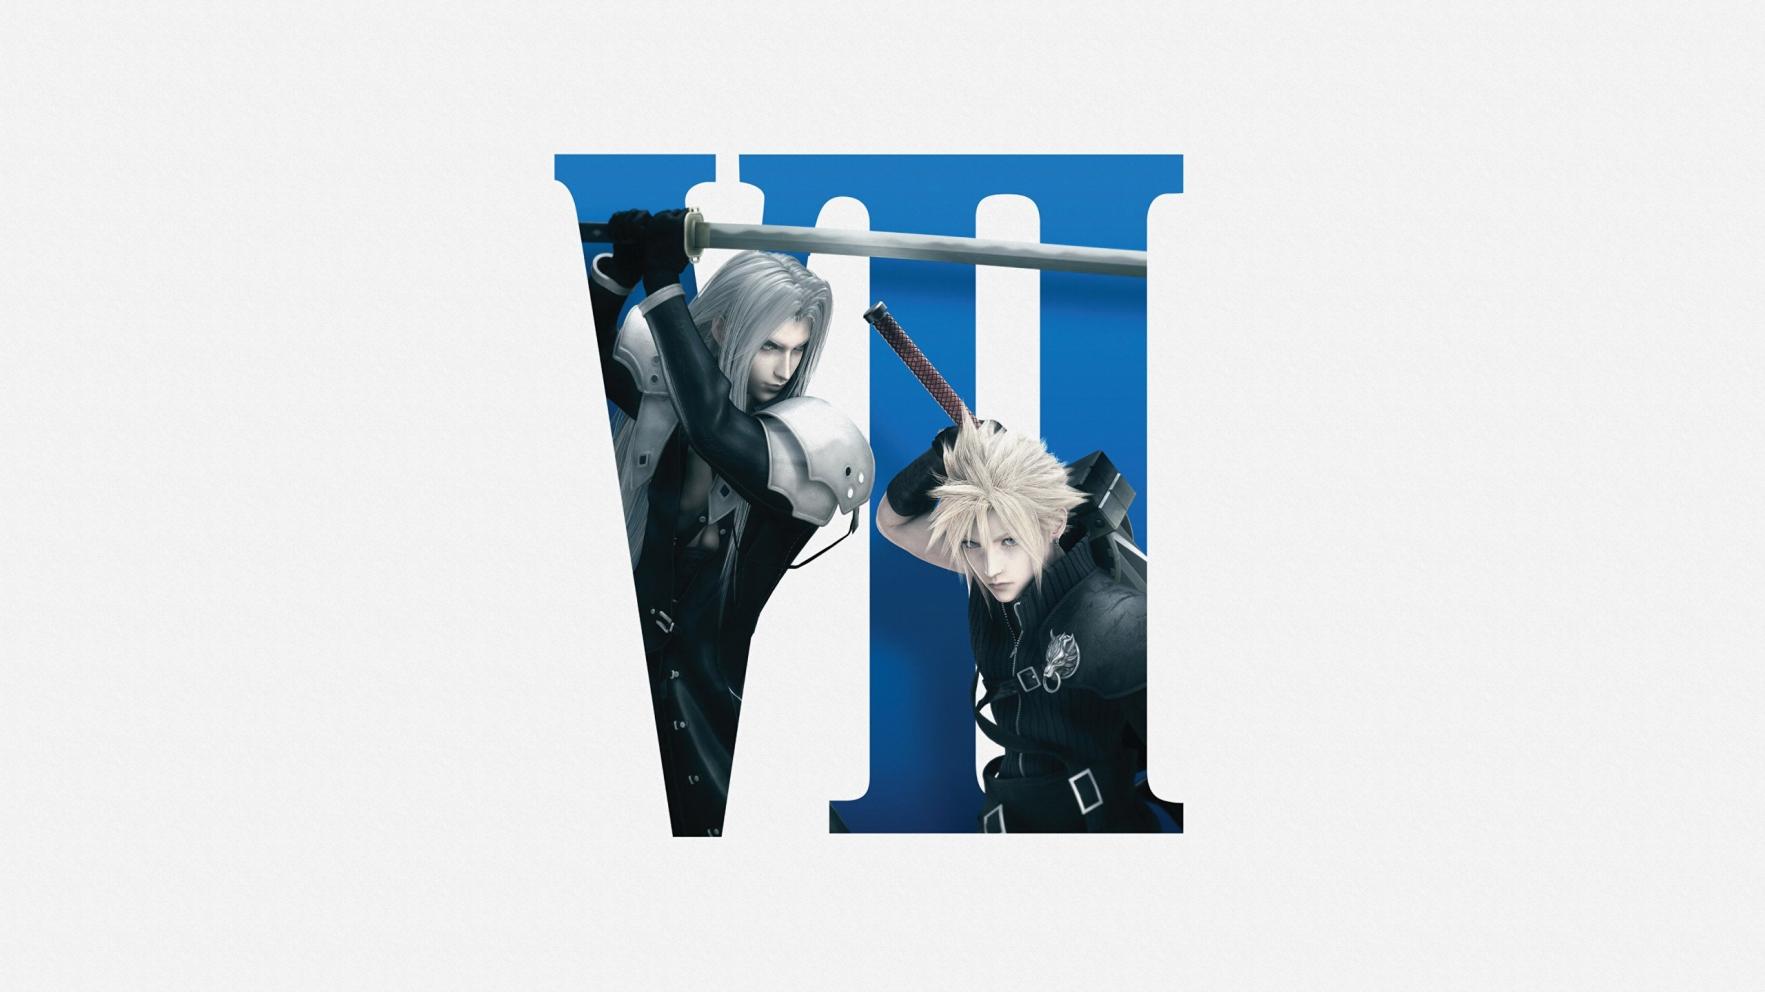 final_fantasy_vii_remake_wallpaper_2560x1440